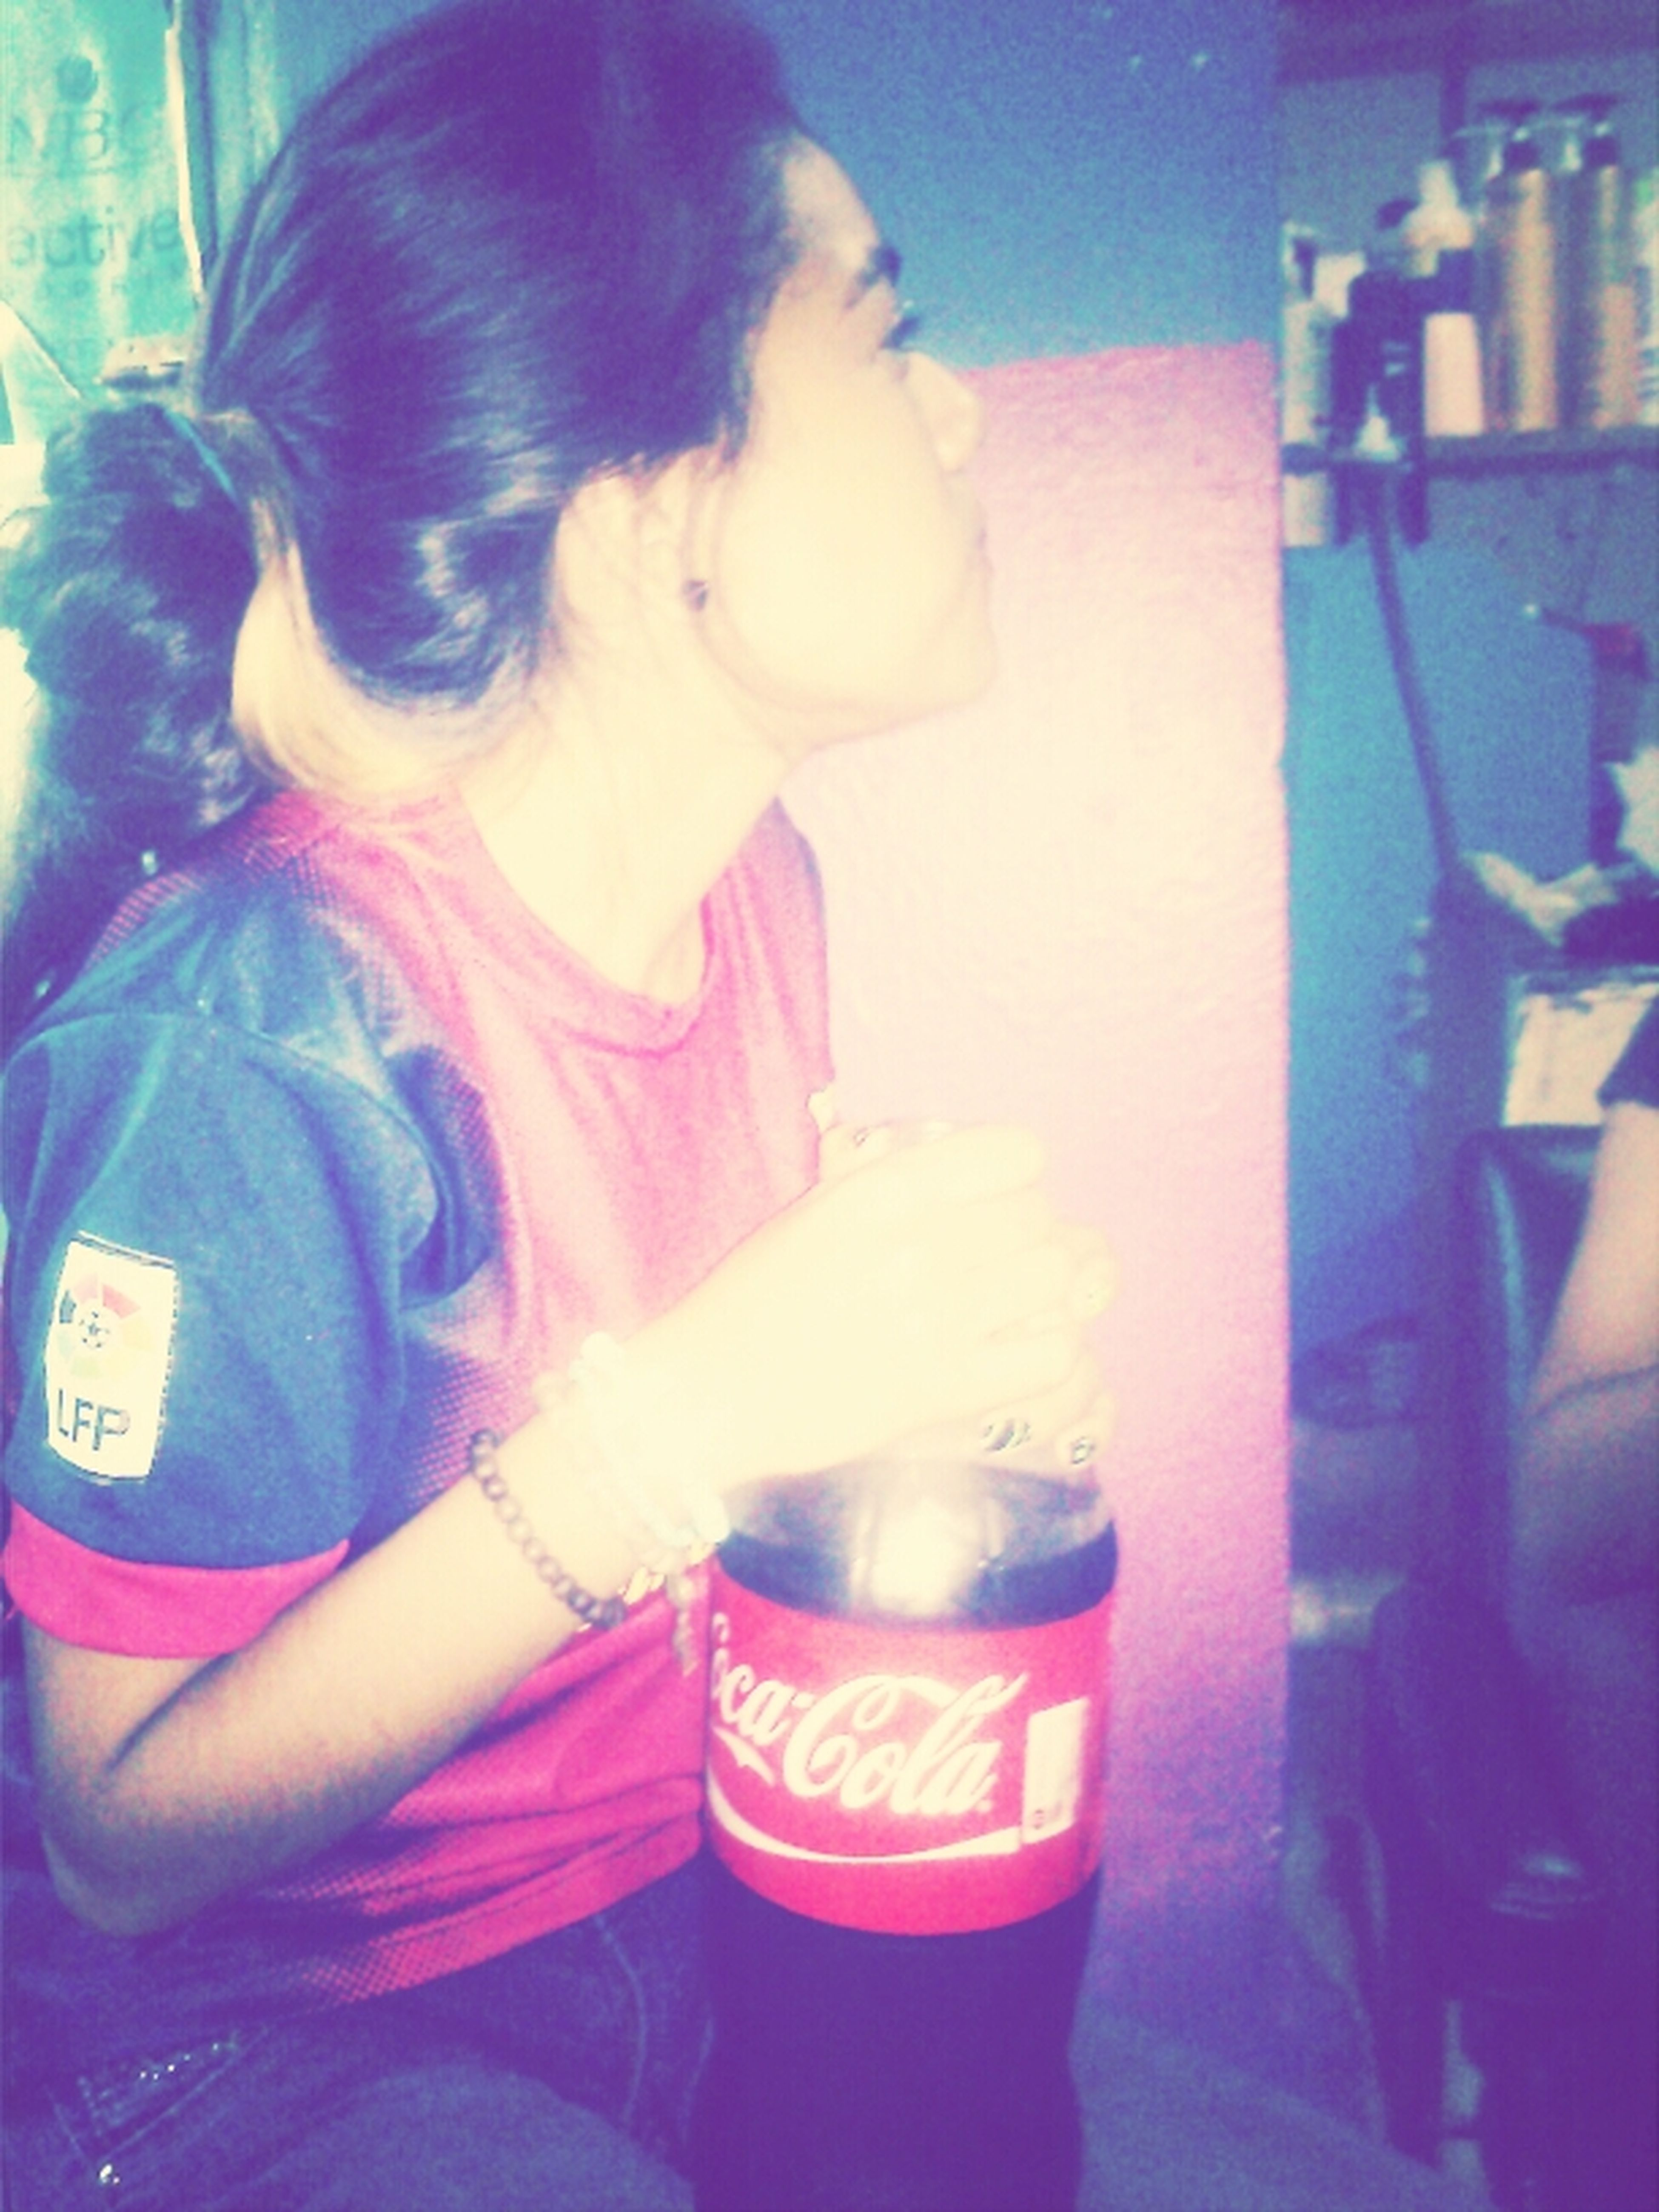 #Hair. #Love #Lips #Cocacola